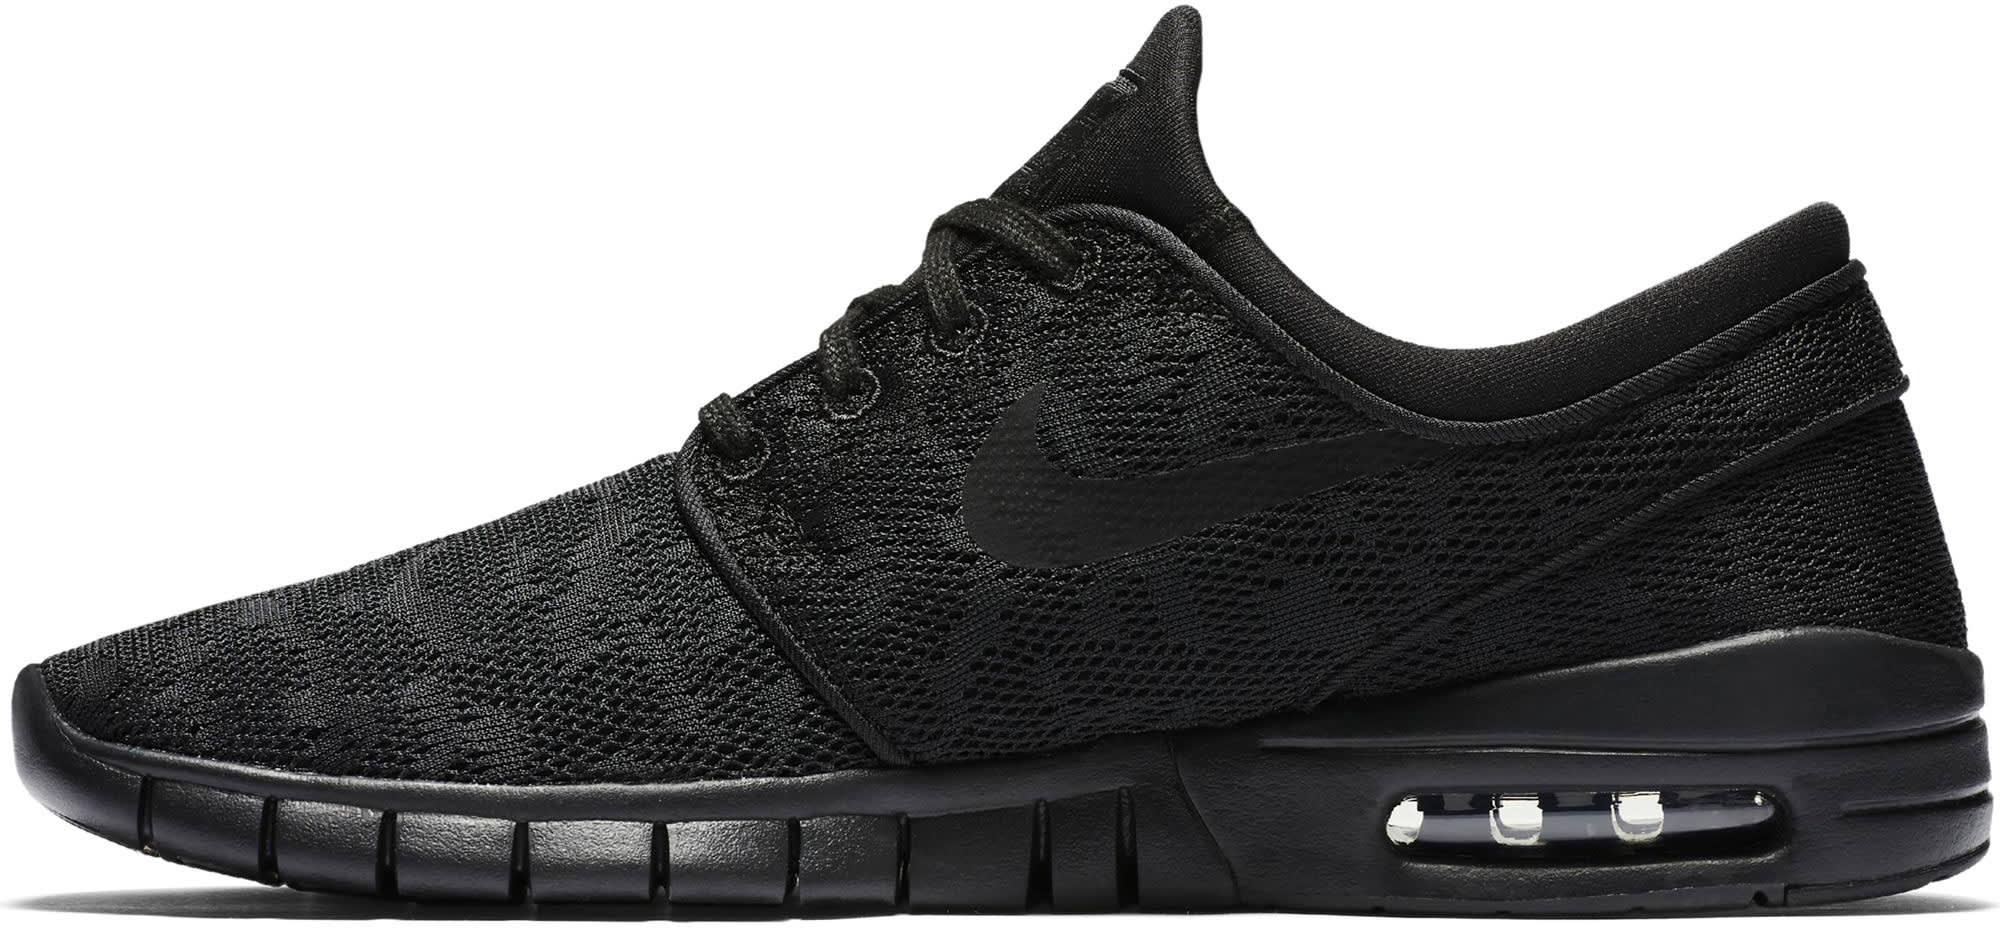 huge discount 7af48 3d41b Nike SB Stefan Janoski Max Skate Shoes - thumbnail 2